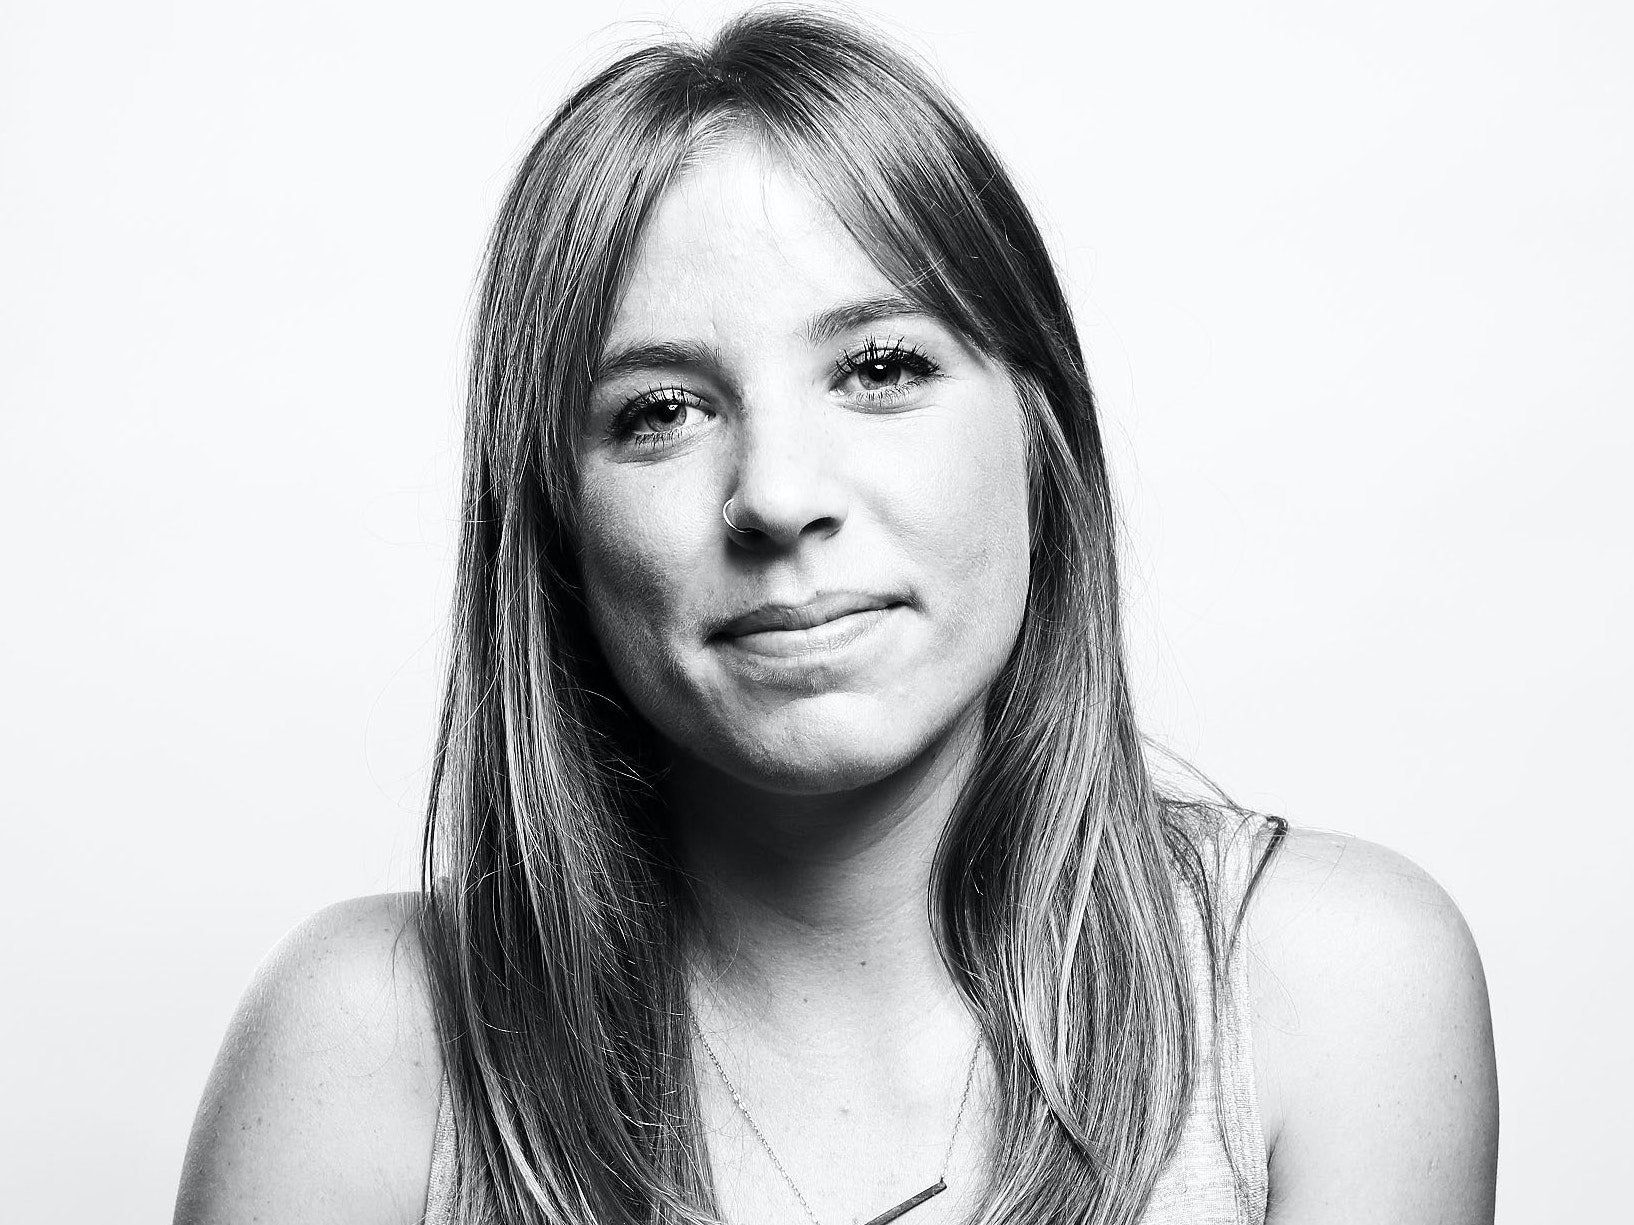 'FiveThirtyEight's Allison McCann on Soccer, Death By Drone   MEDIA DIET